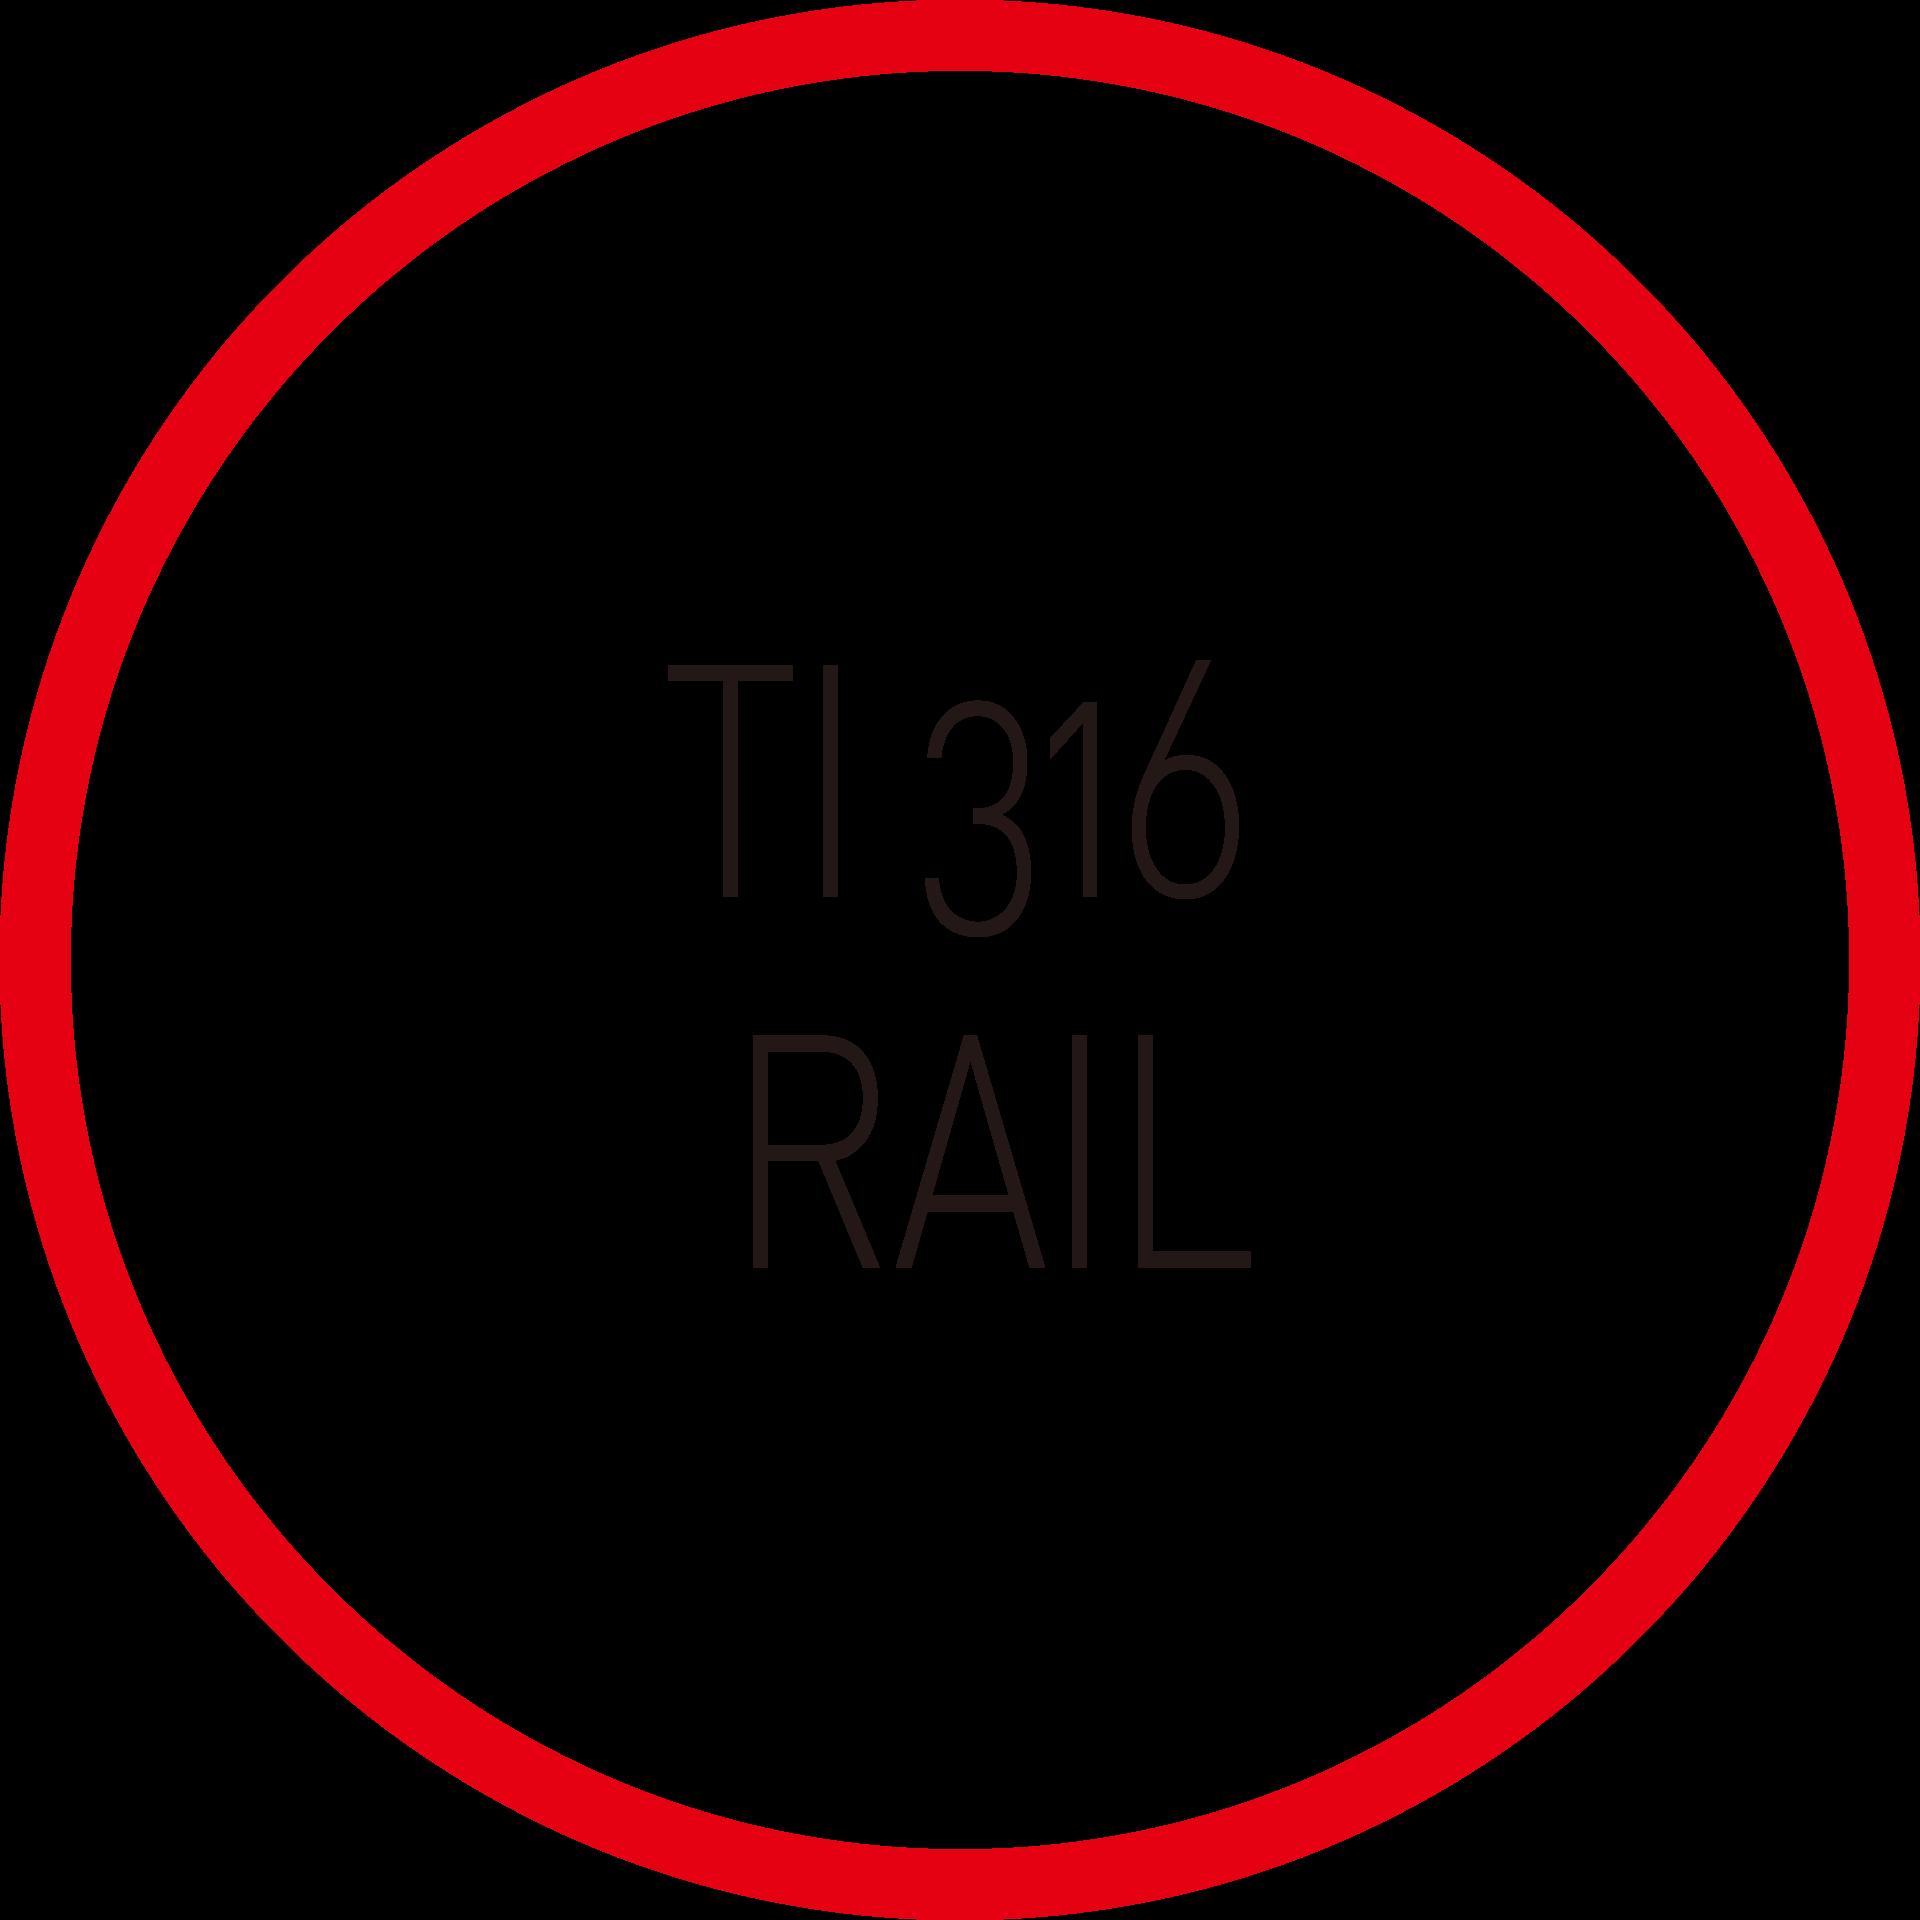 Selle-Italia-material-TI316-Rail